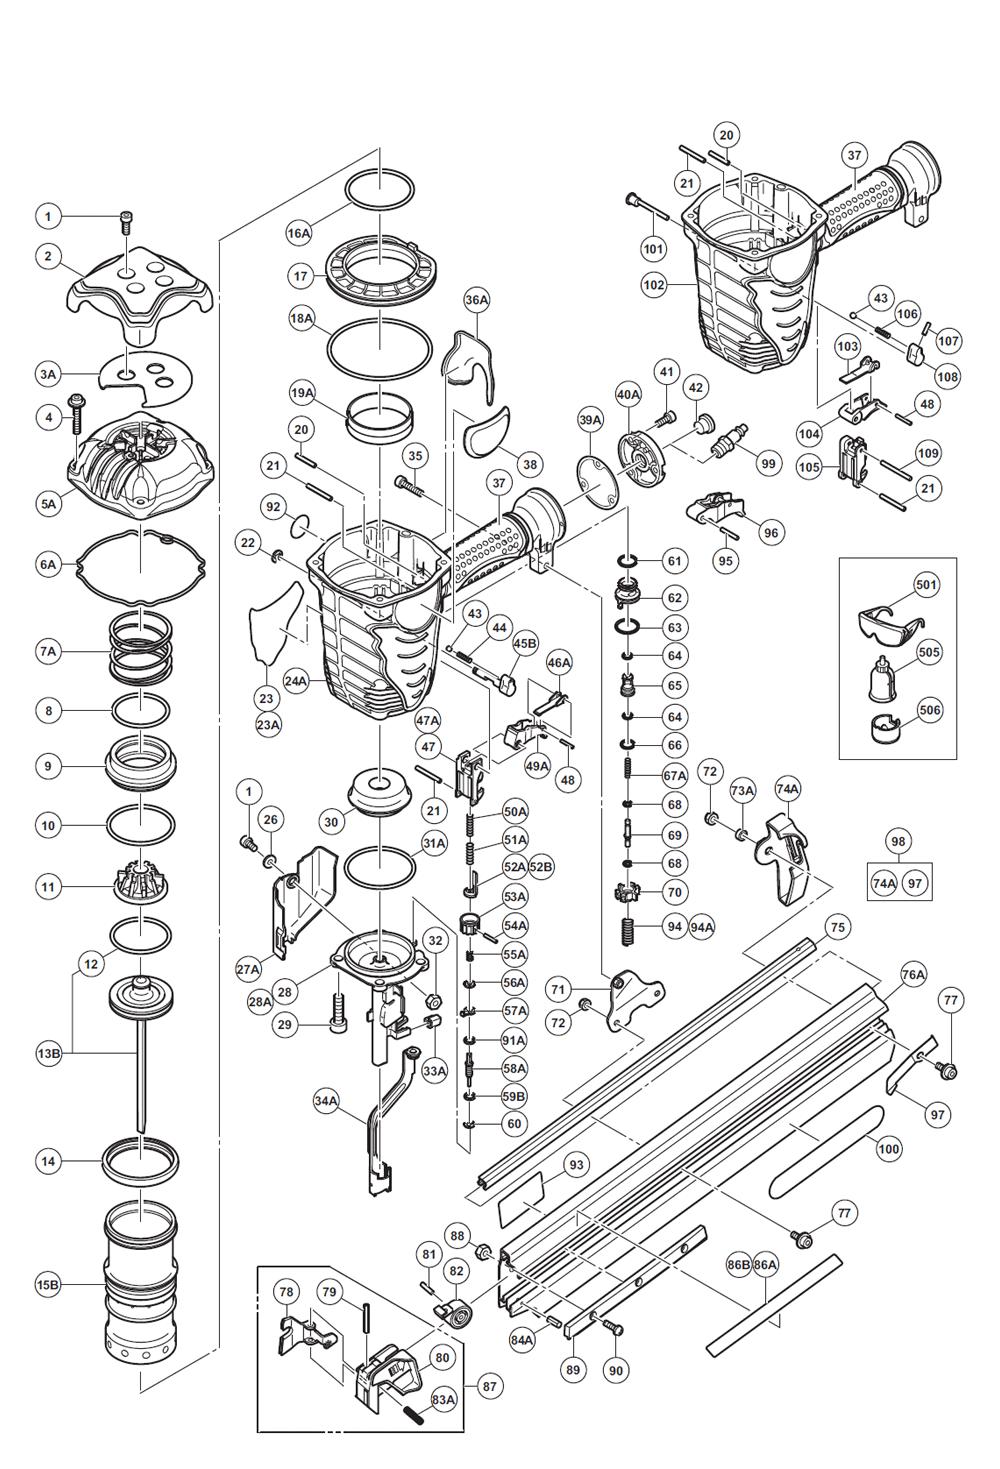 hitachi nr90aes parts schematic